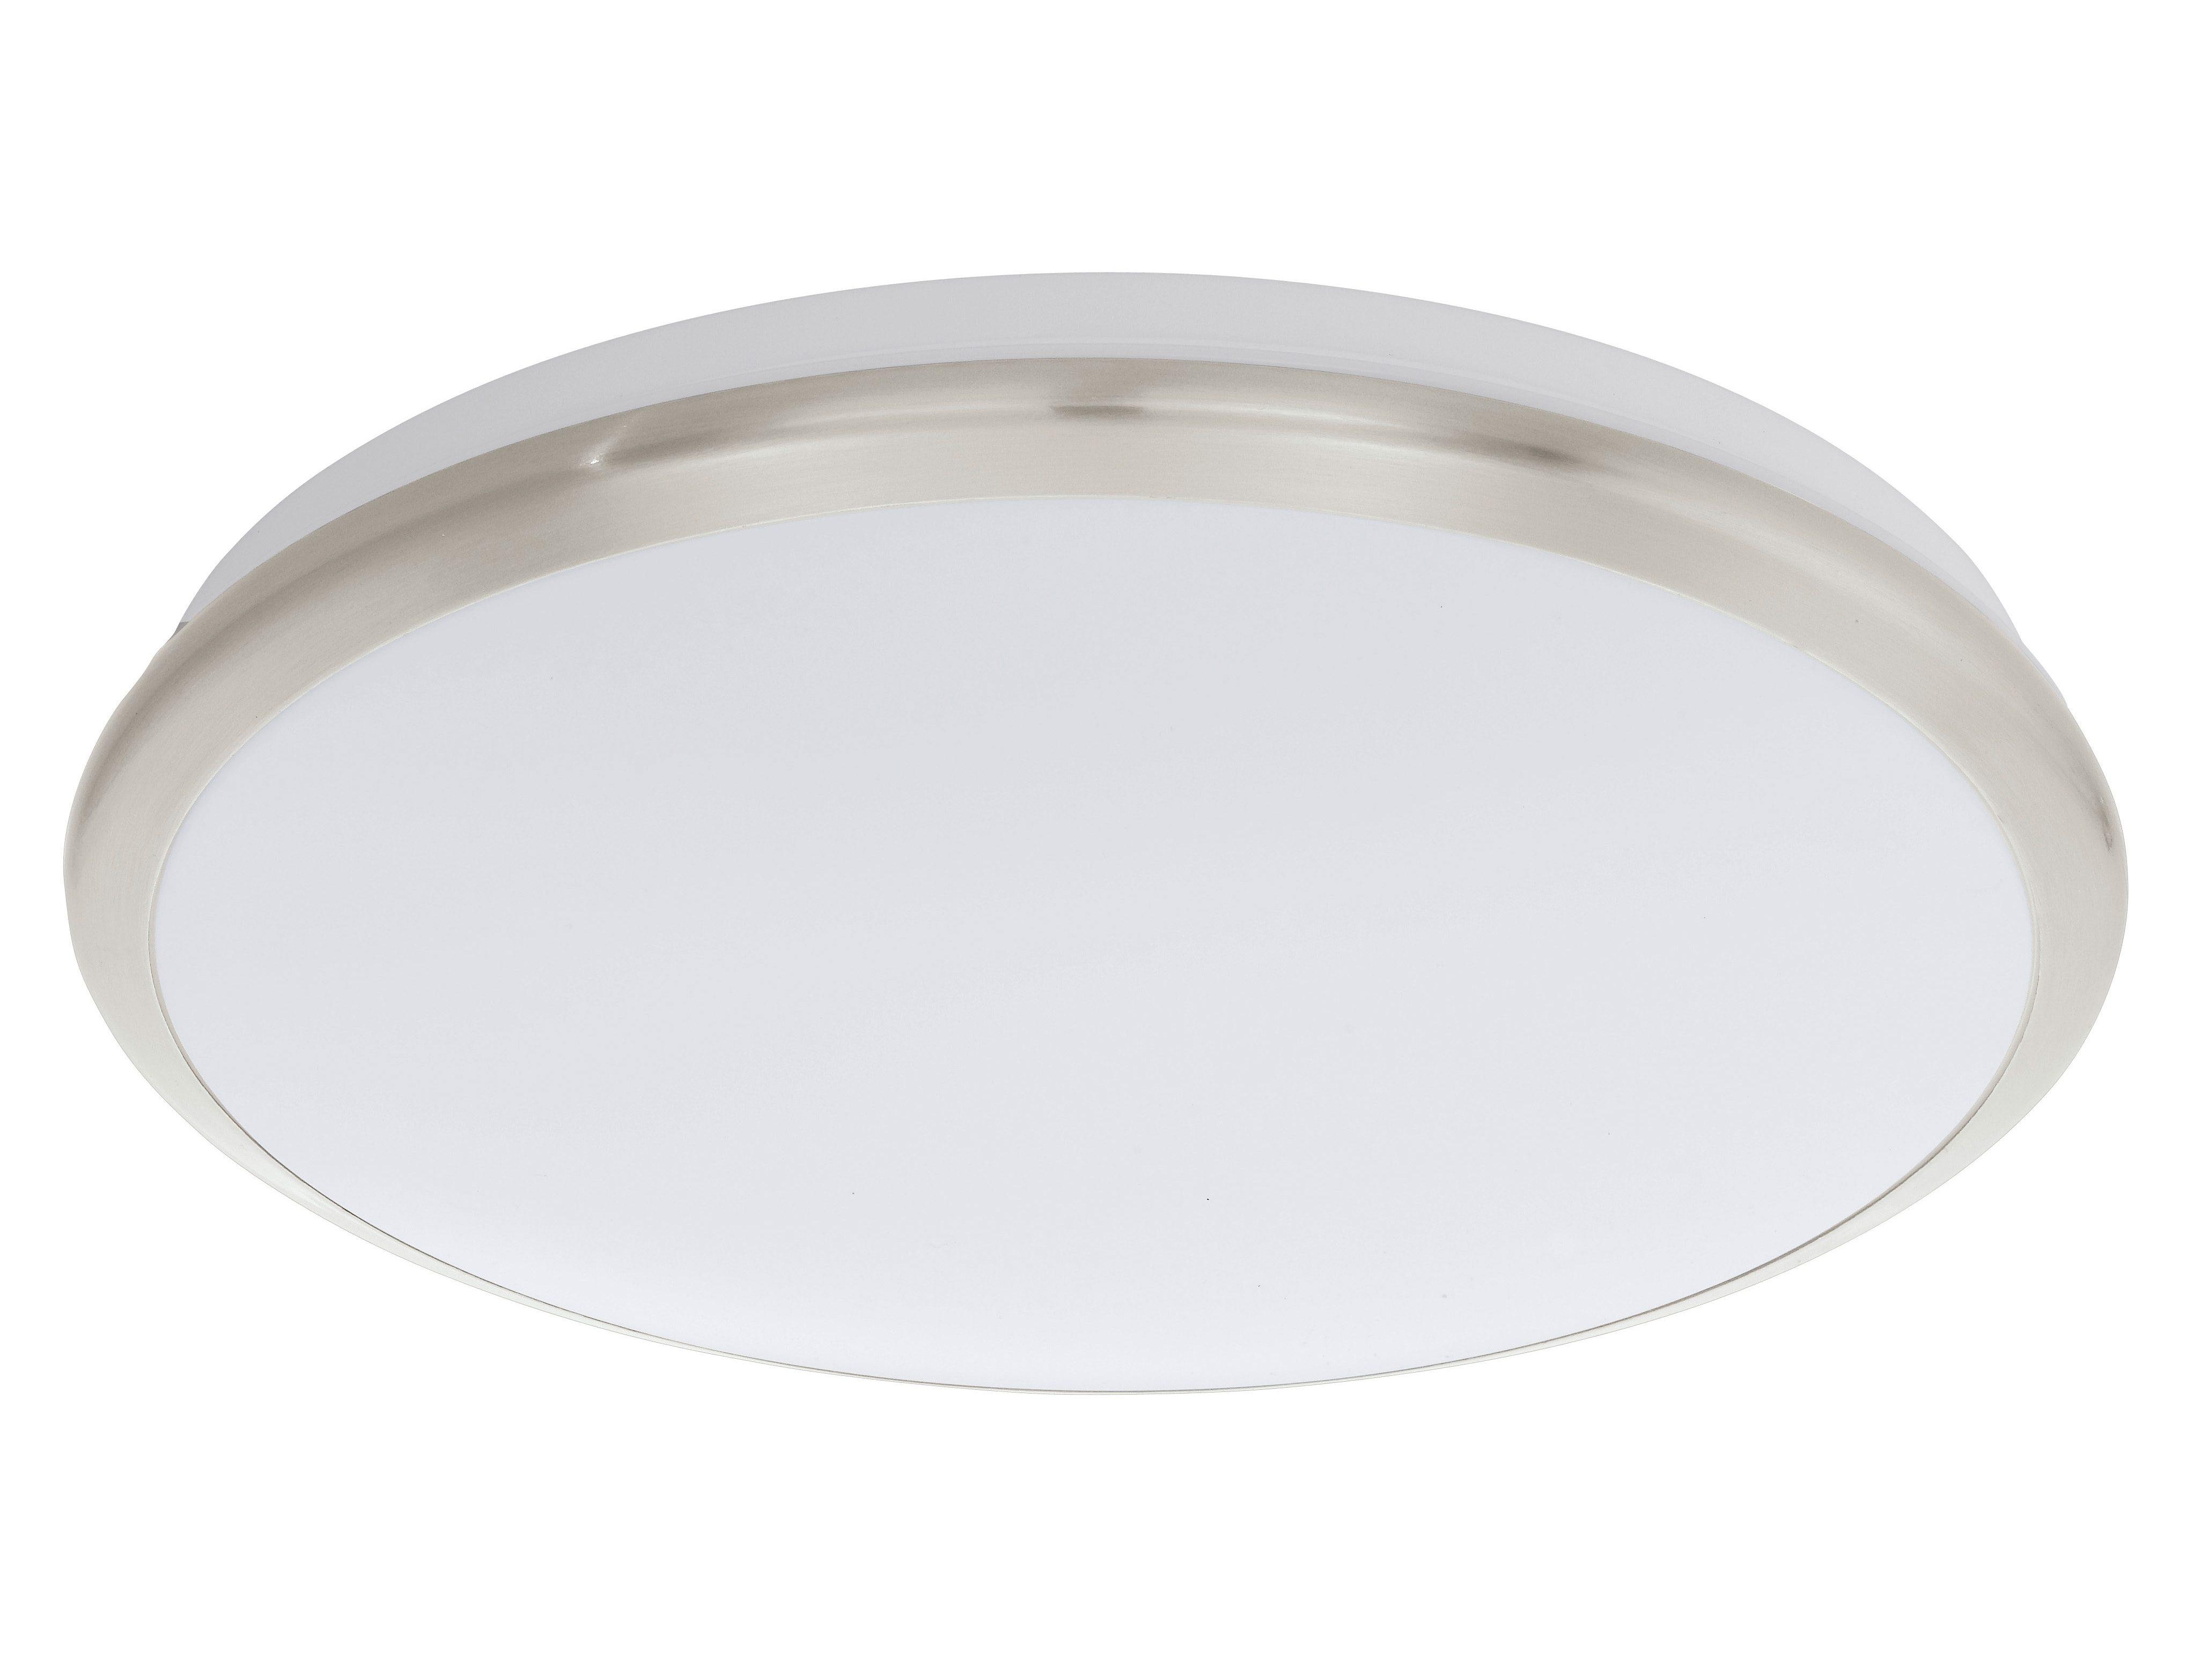 EGLO LED Deckenleuchte MANILVA, LED-Board, Warmweiß, LED tauschbar